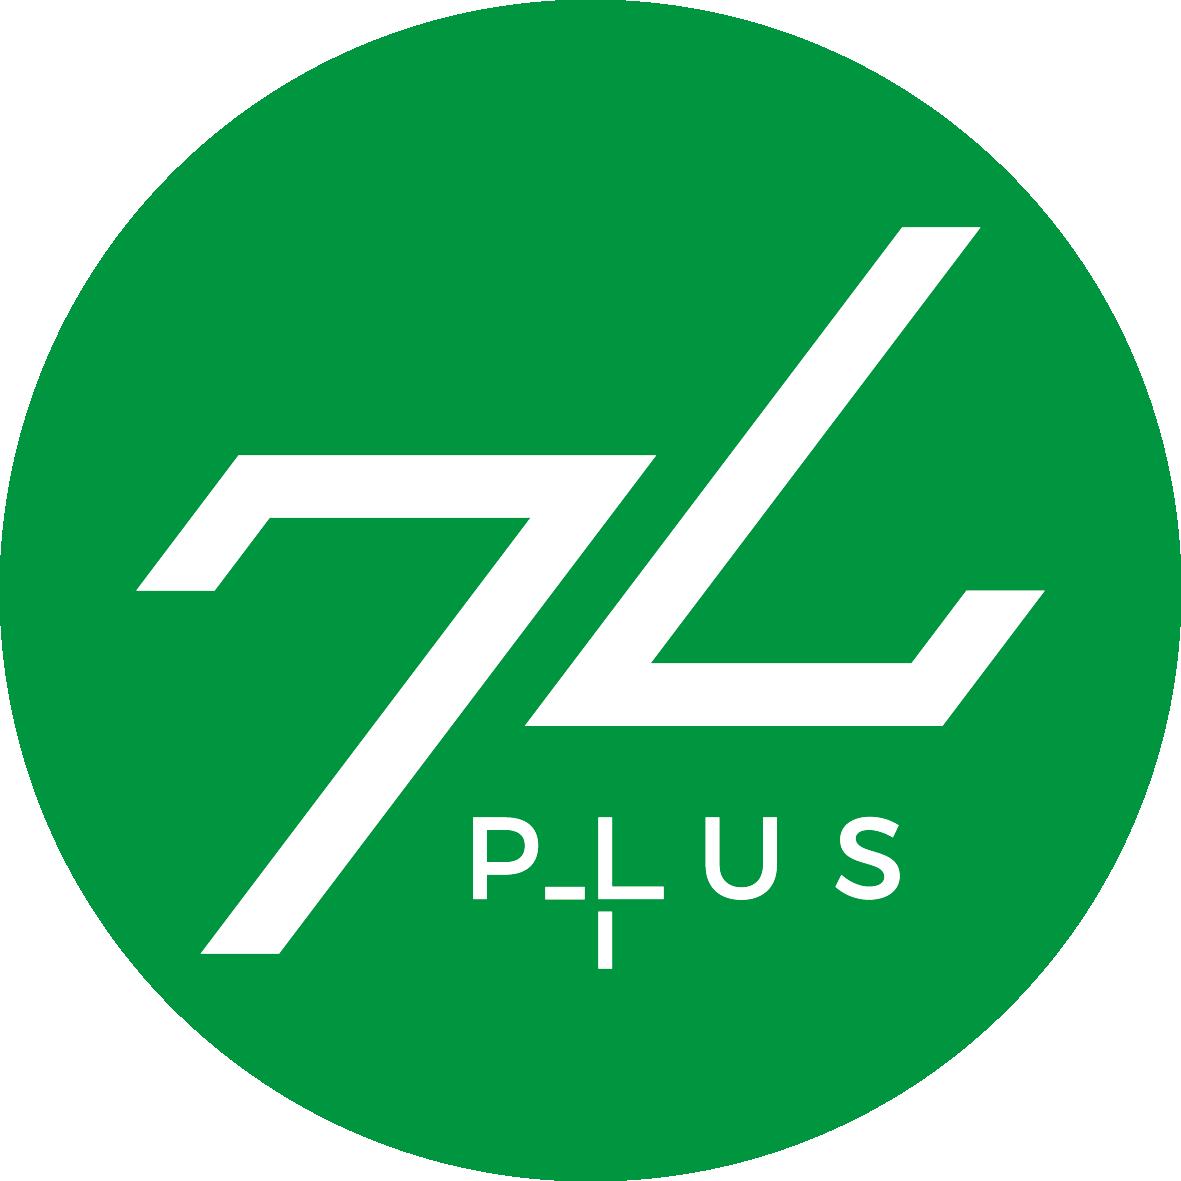 74 PLUS associazione benefica